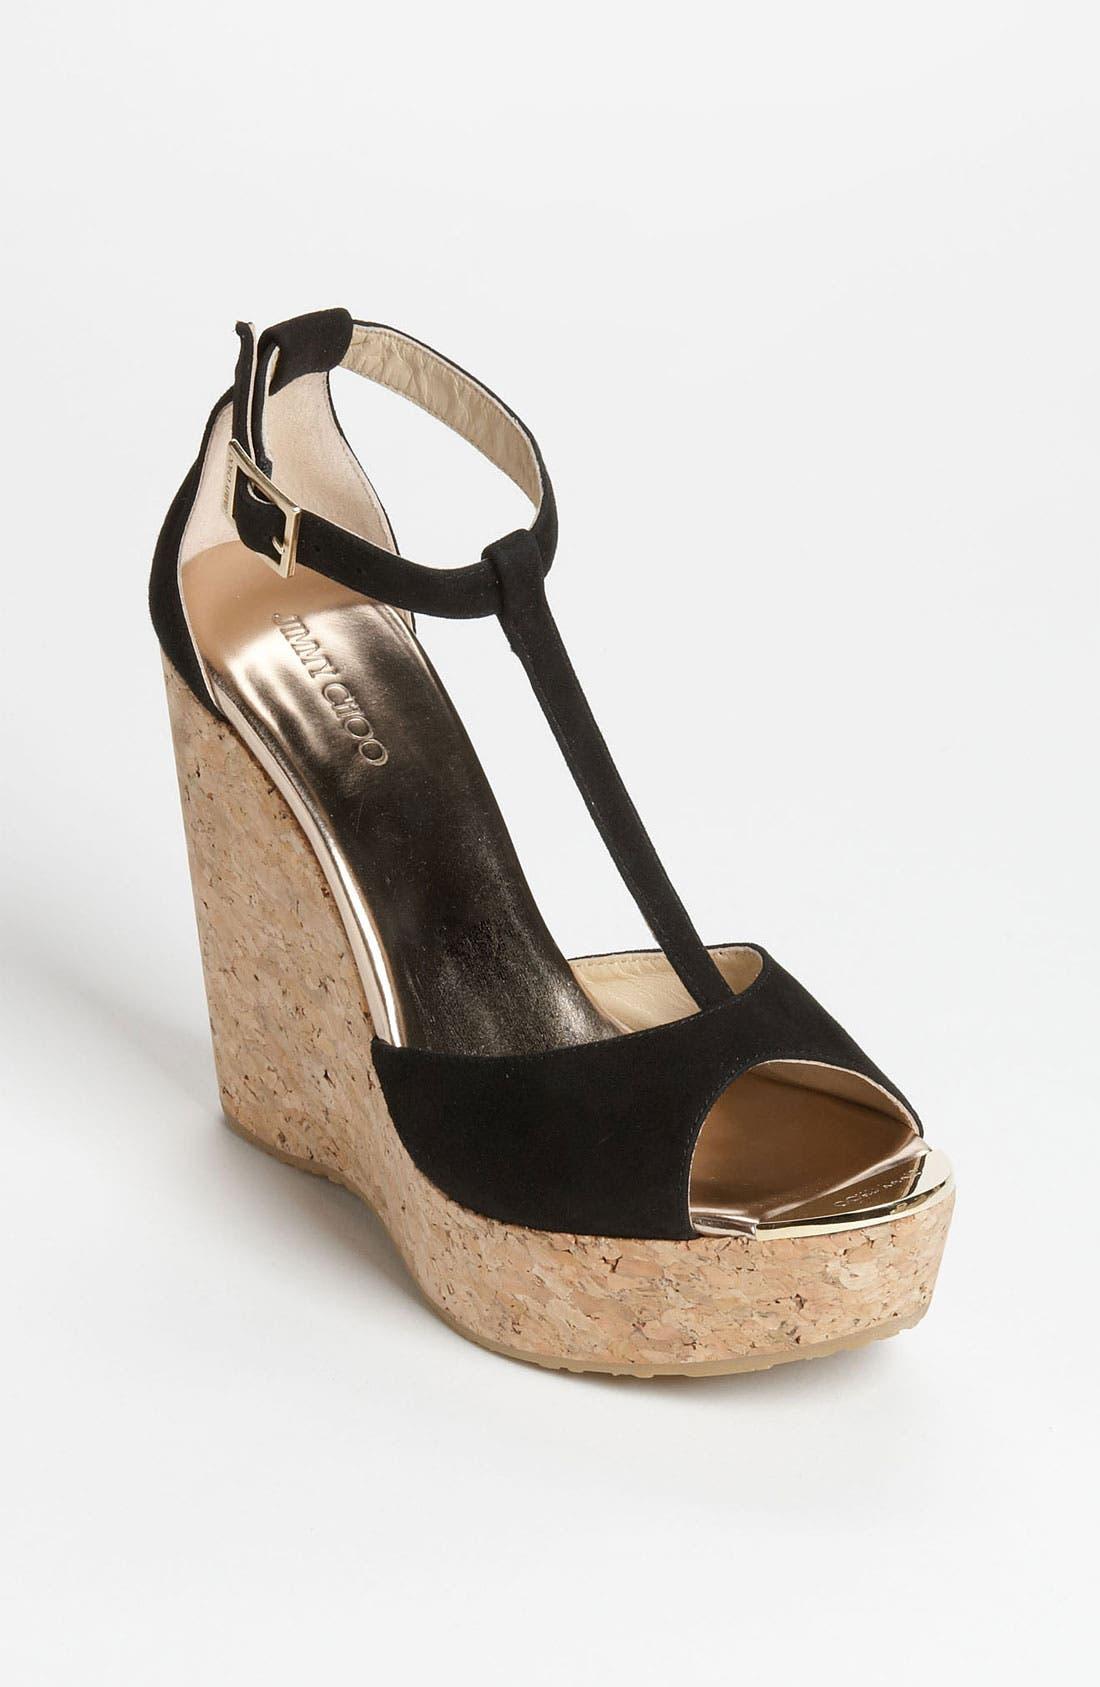 Main Image - Jimmy Choo 'Pela' Cork Sandal